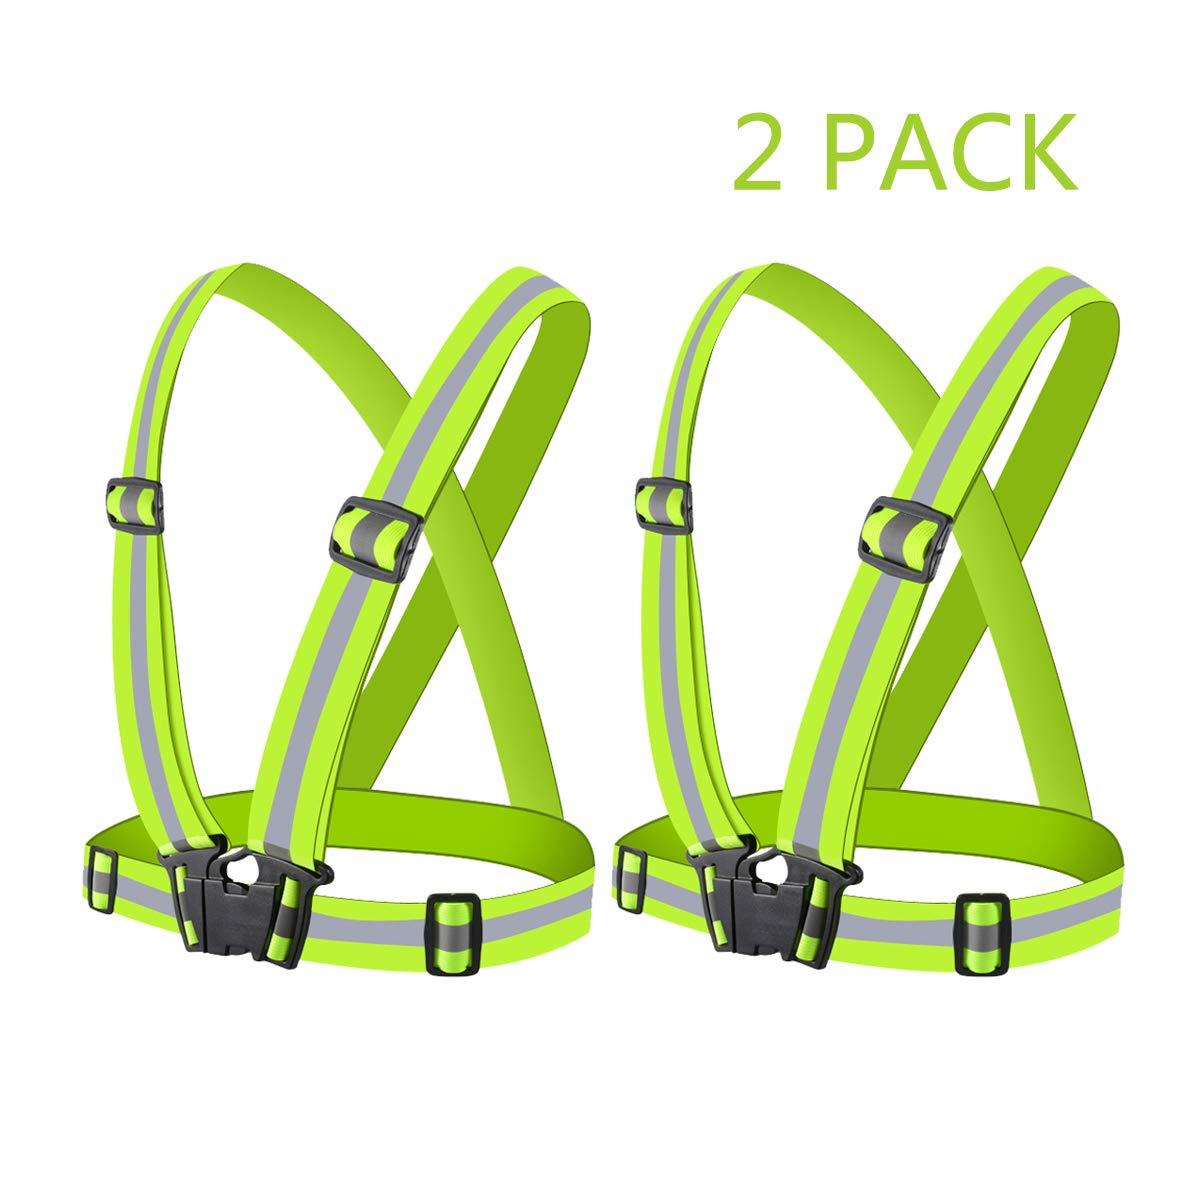 Elastic and Adjustable Reflective Gear for Running Flytt Reflective Vest 2 Pack